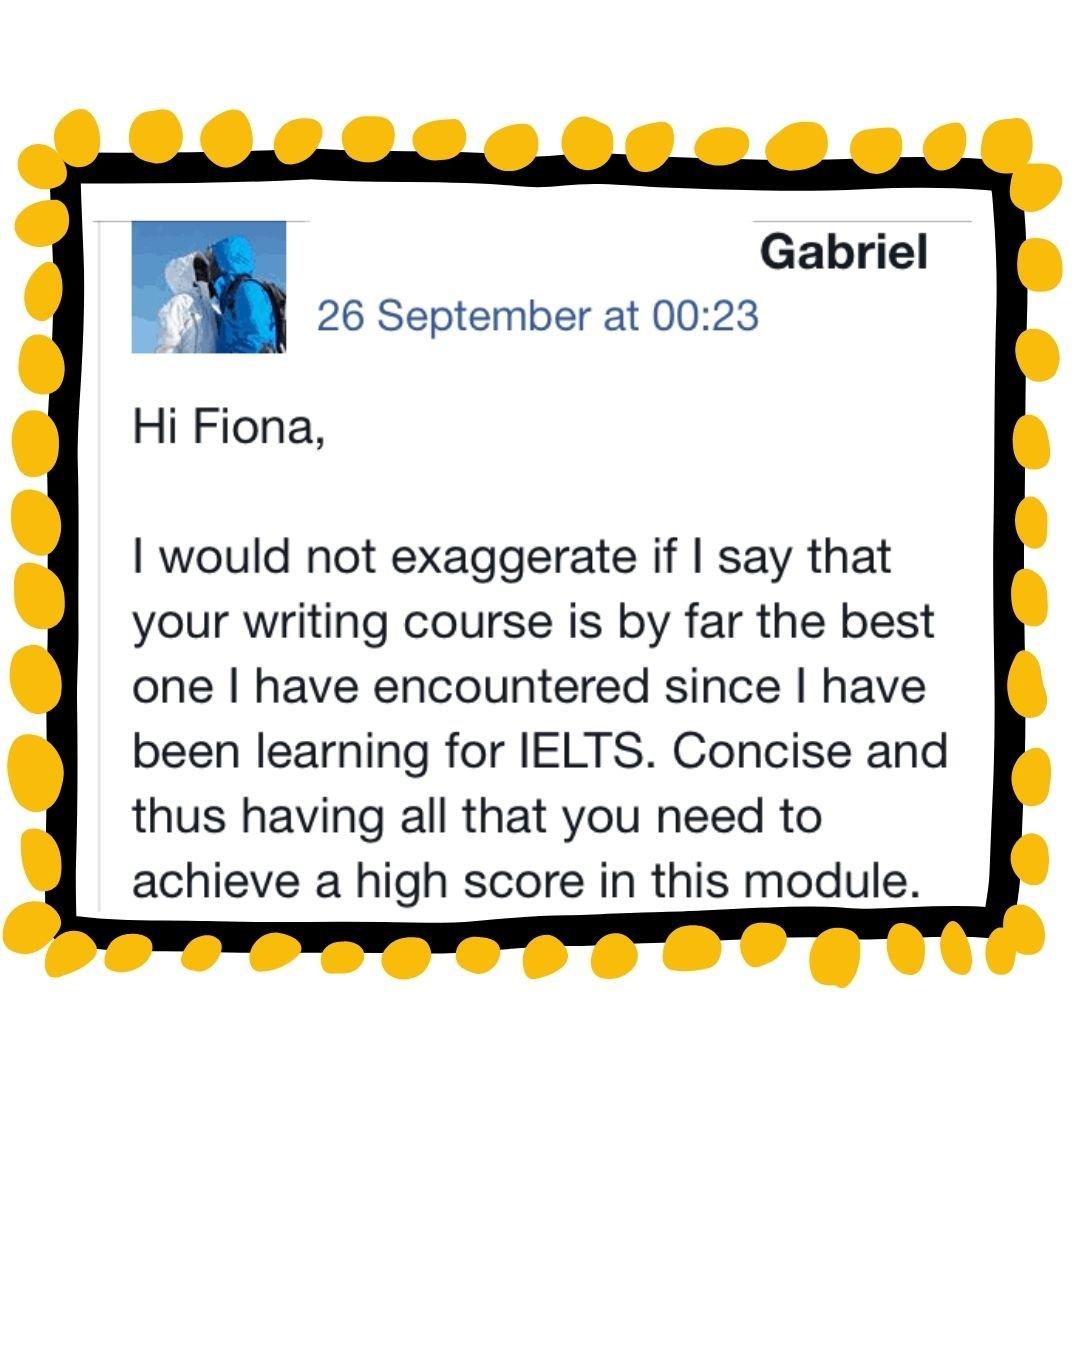 IELTS with Fiona reviews Gabriel